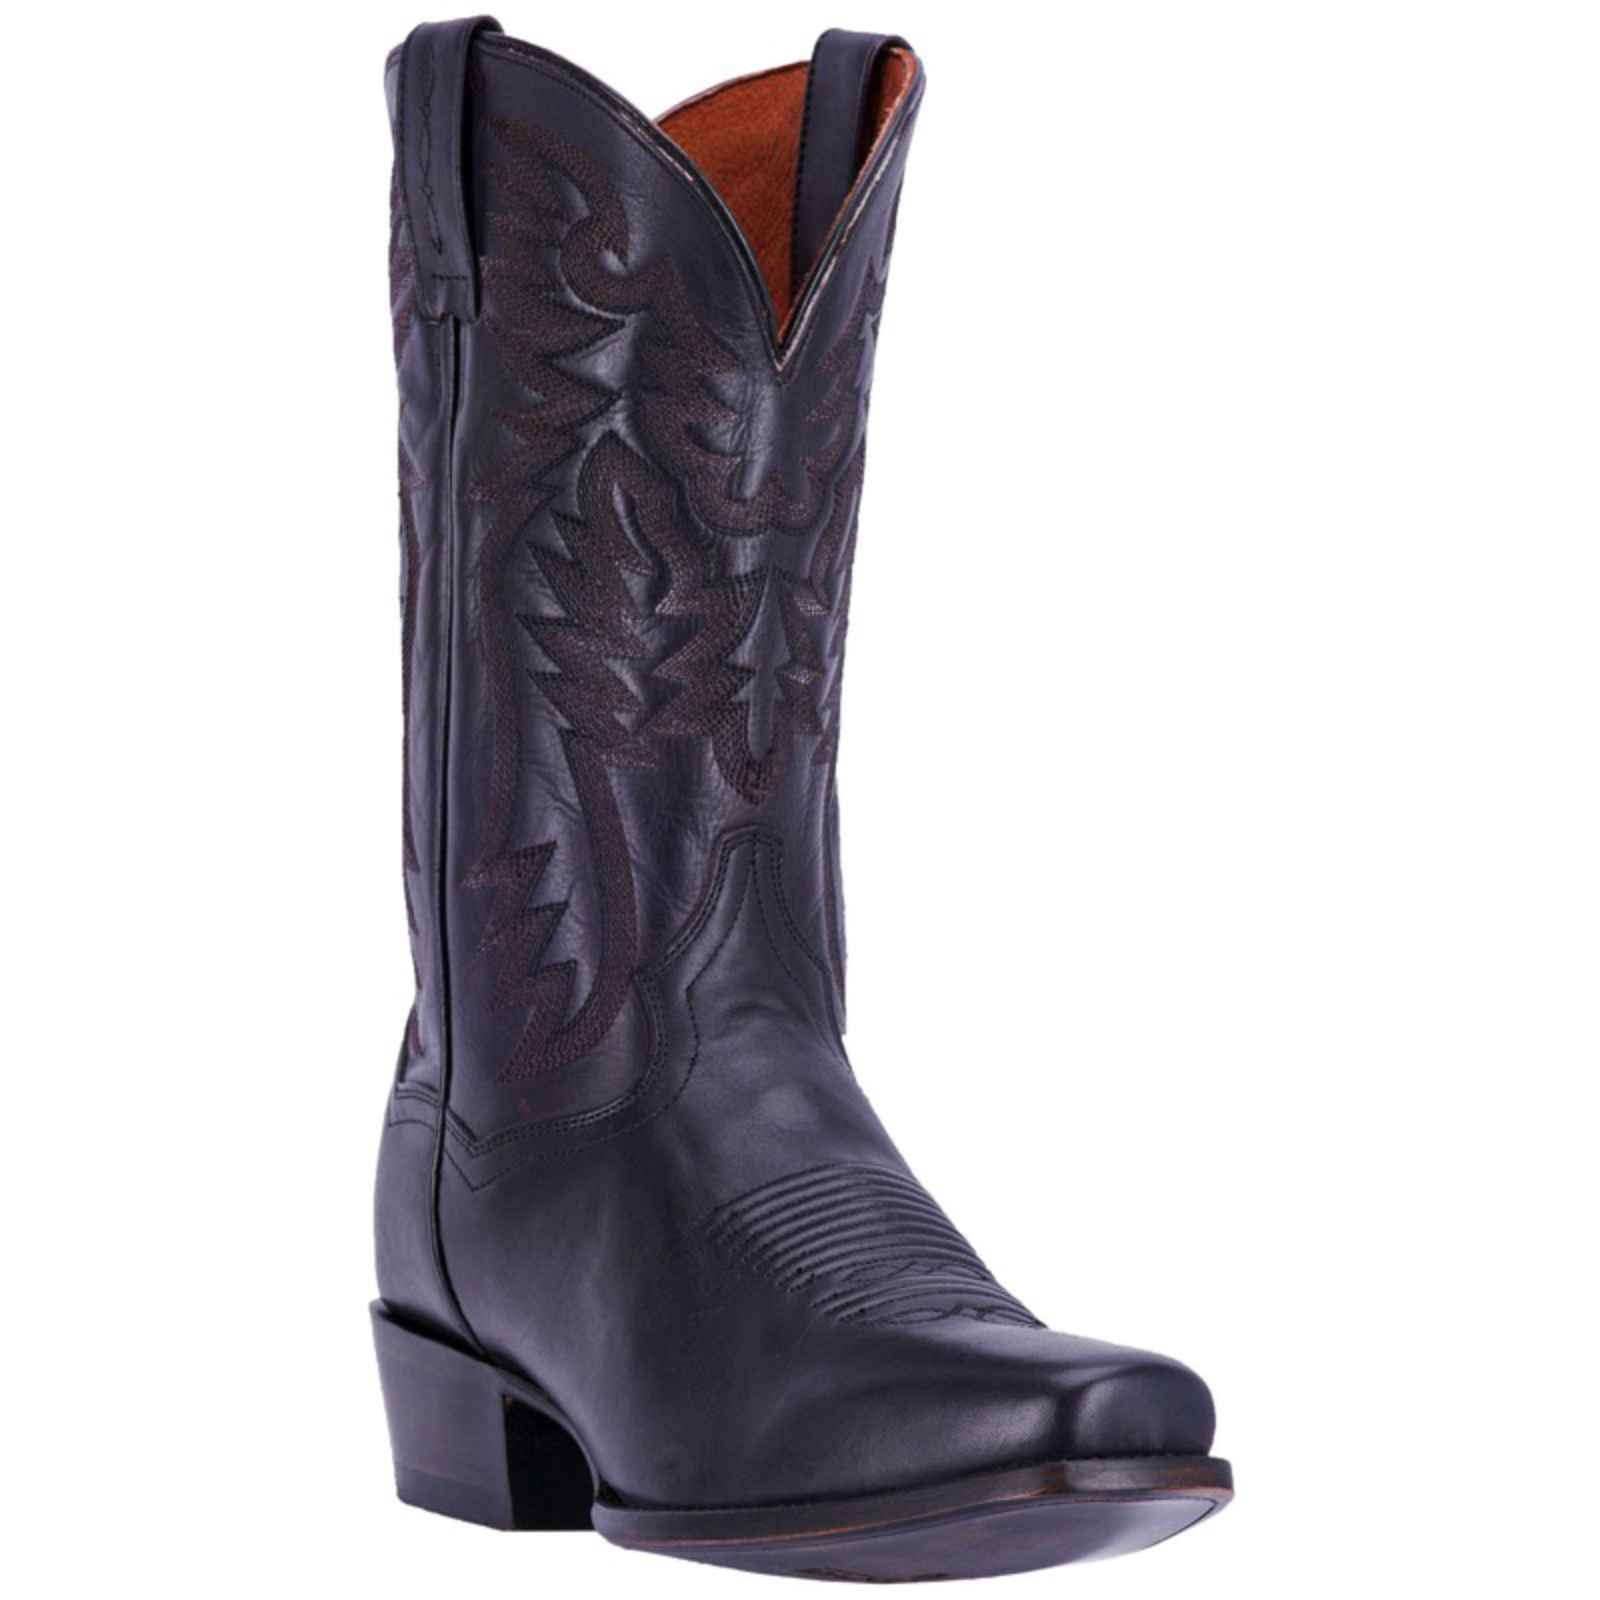 "Dan Post Men's 13"" Black Centennial Ultimate Flex Insole Western Boots, DP2160 by DAN POST"